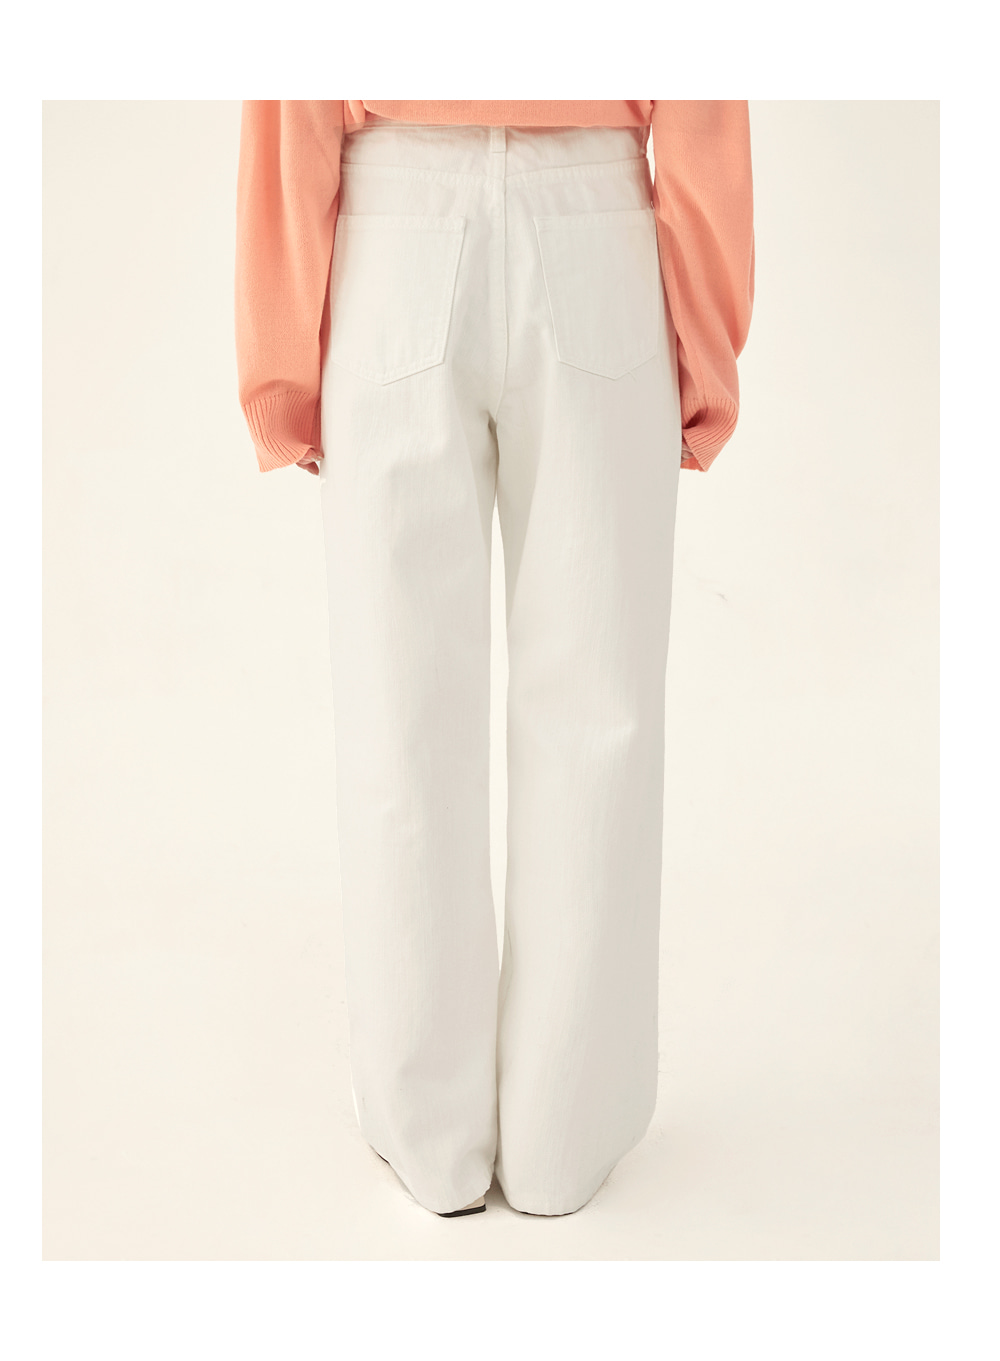 wolf straight cotton pants (s, m)